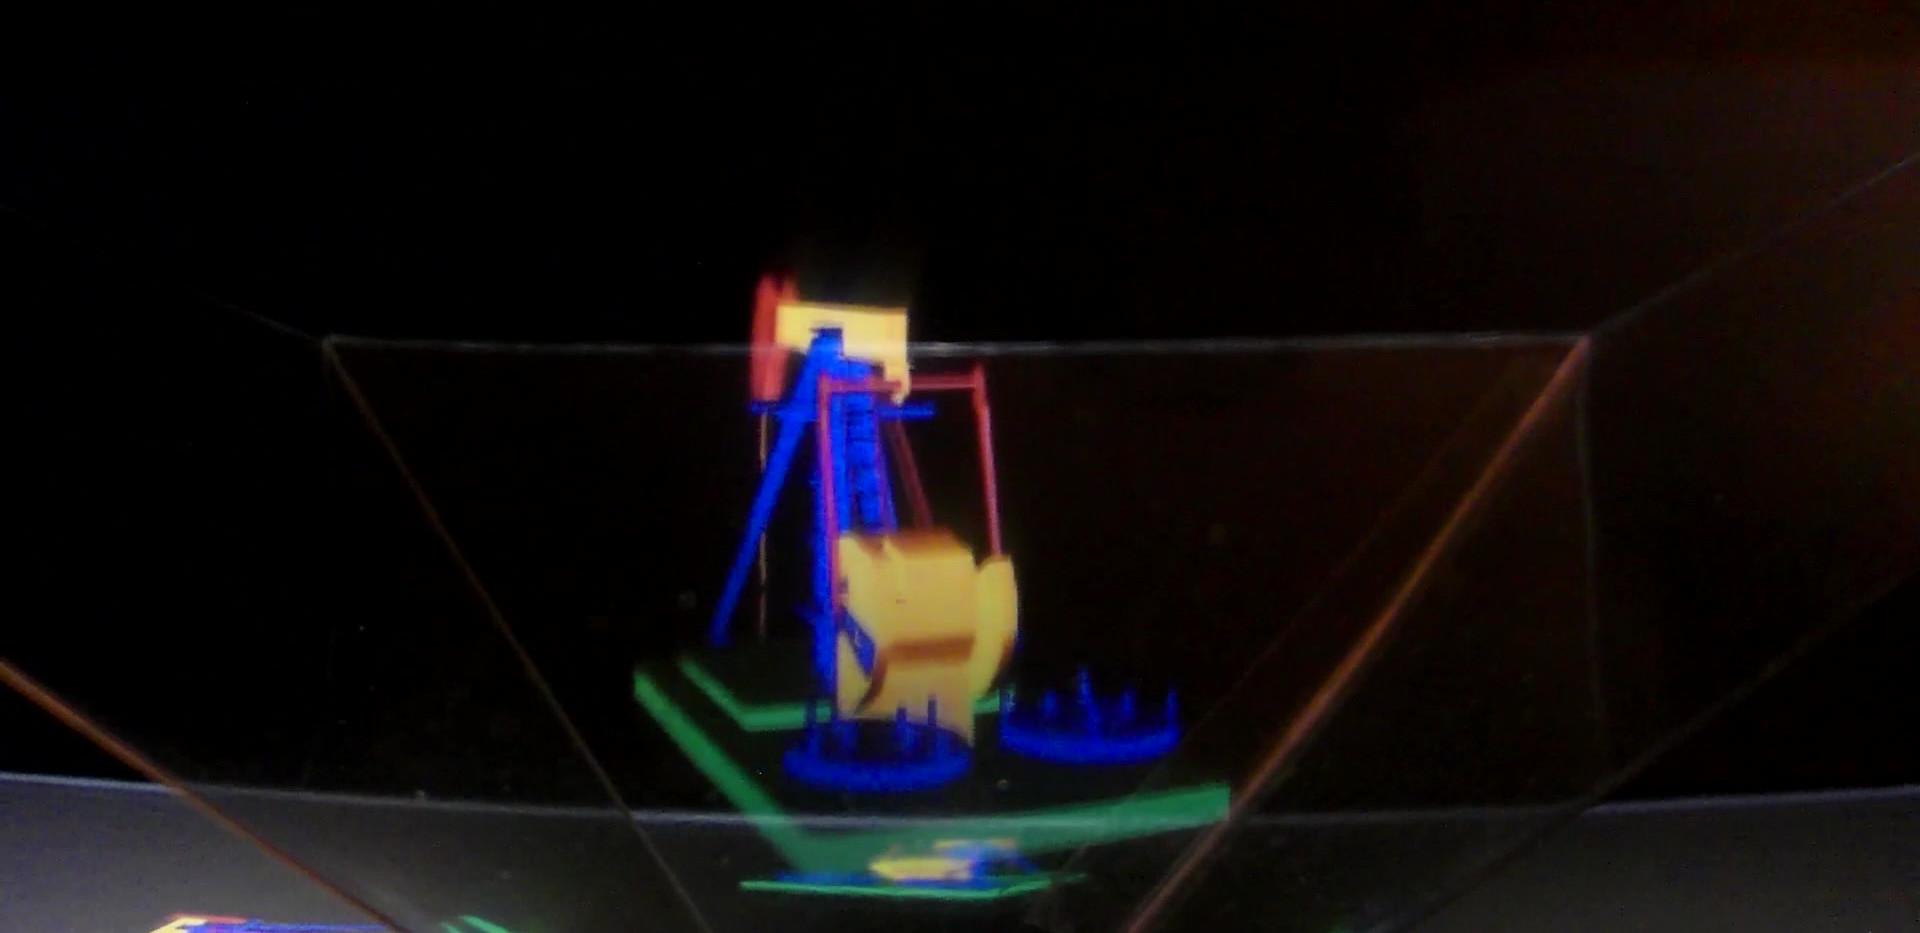 Pumpjacks - Zoetrope + Hologram